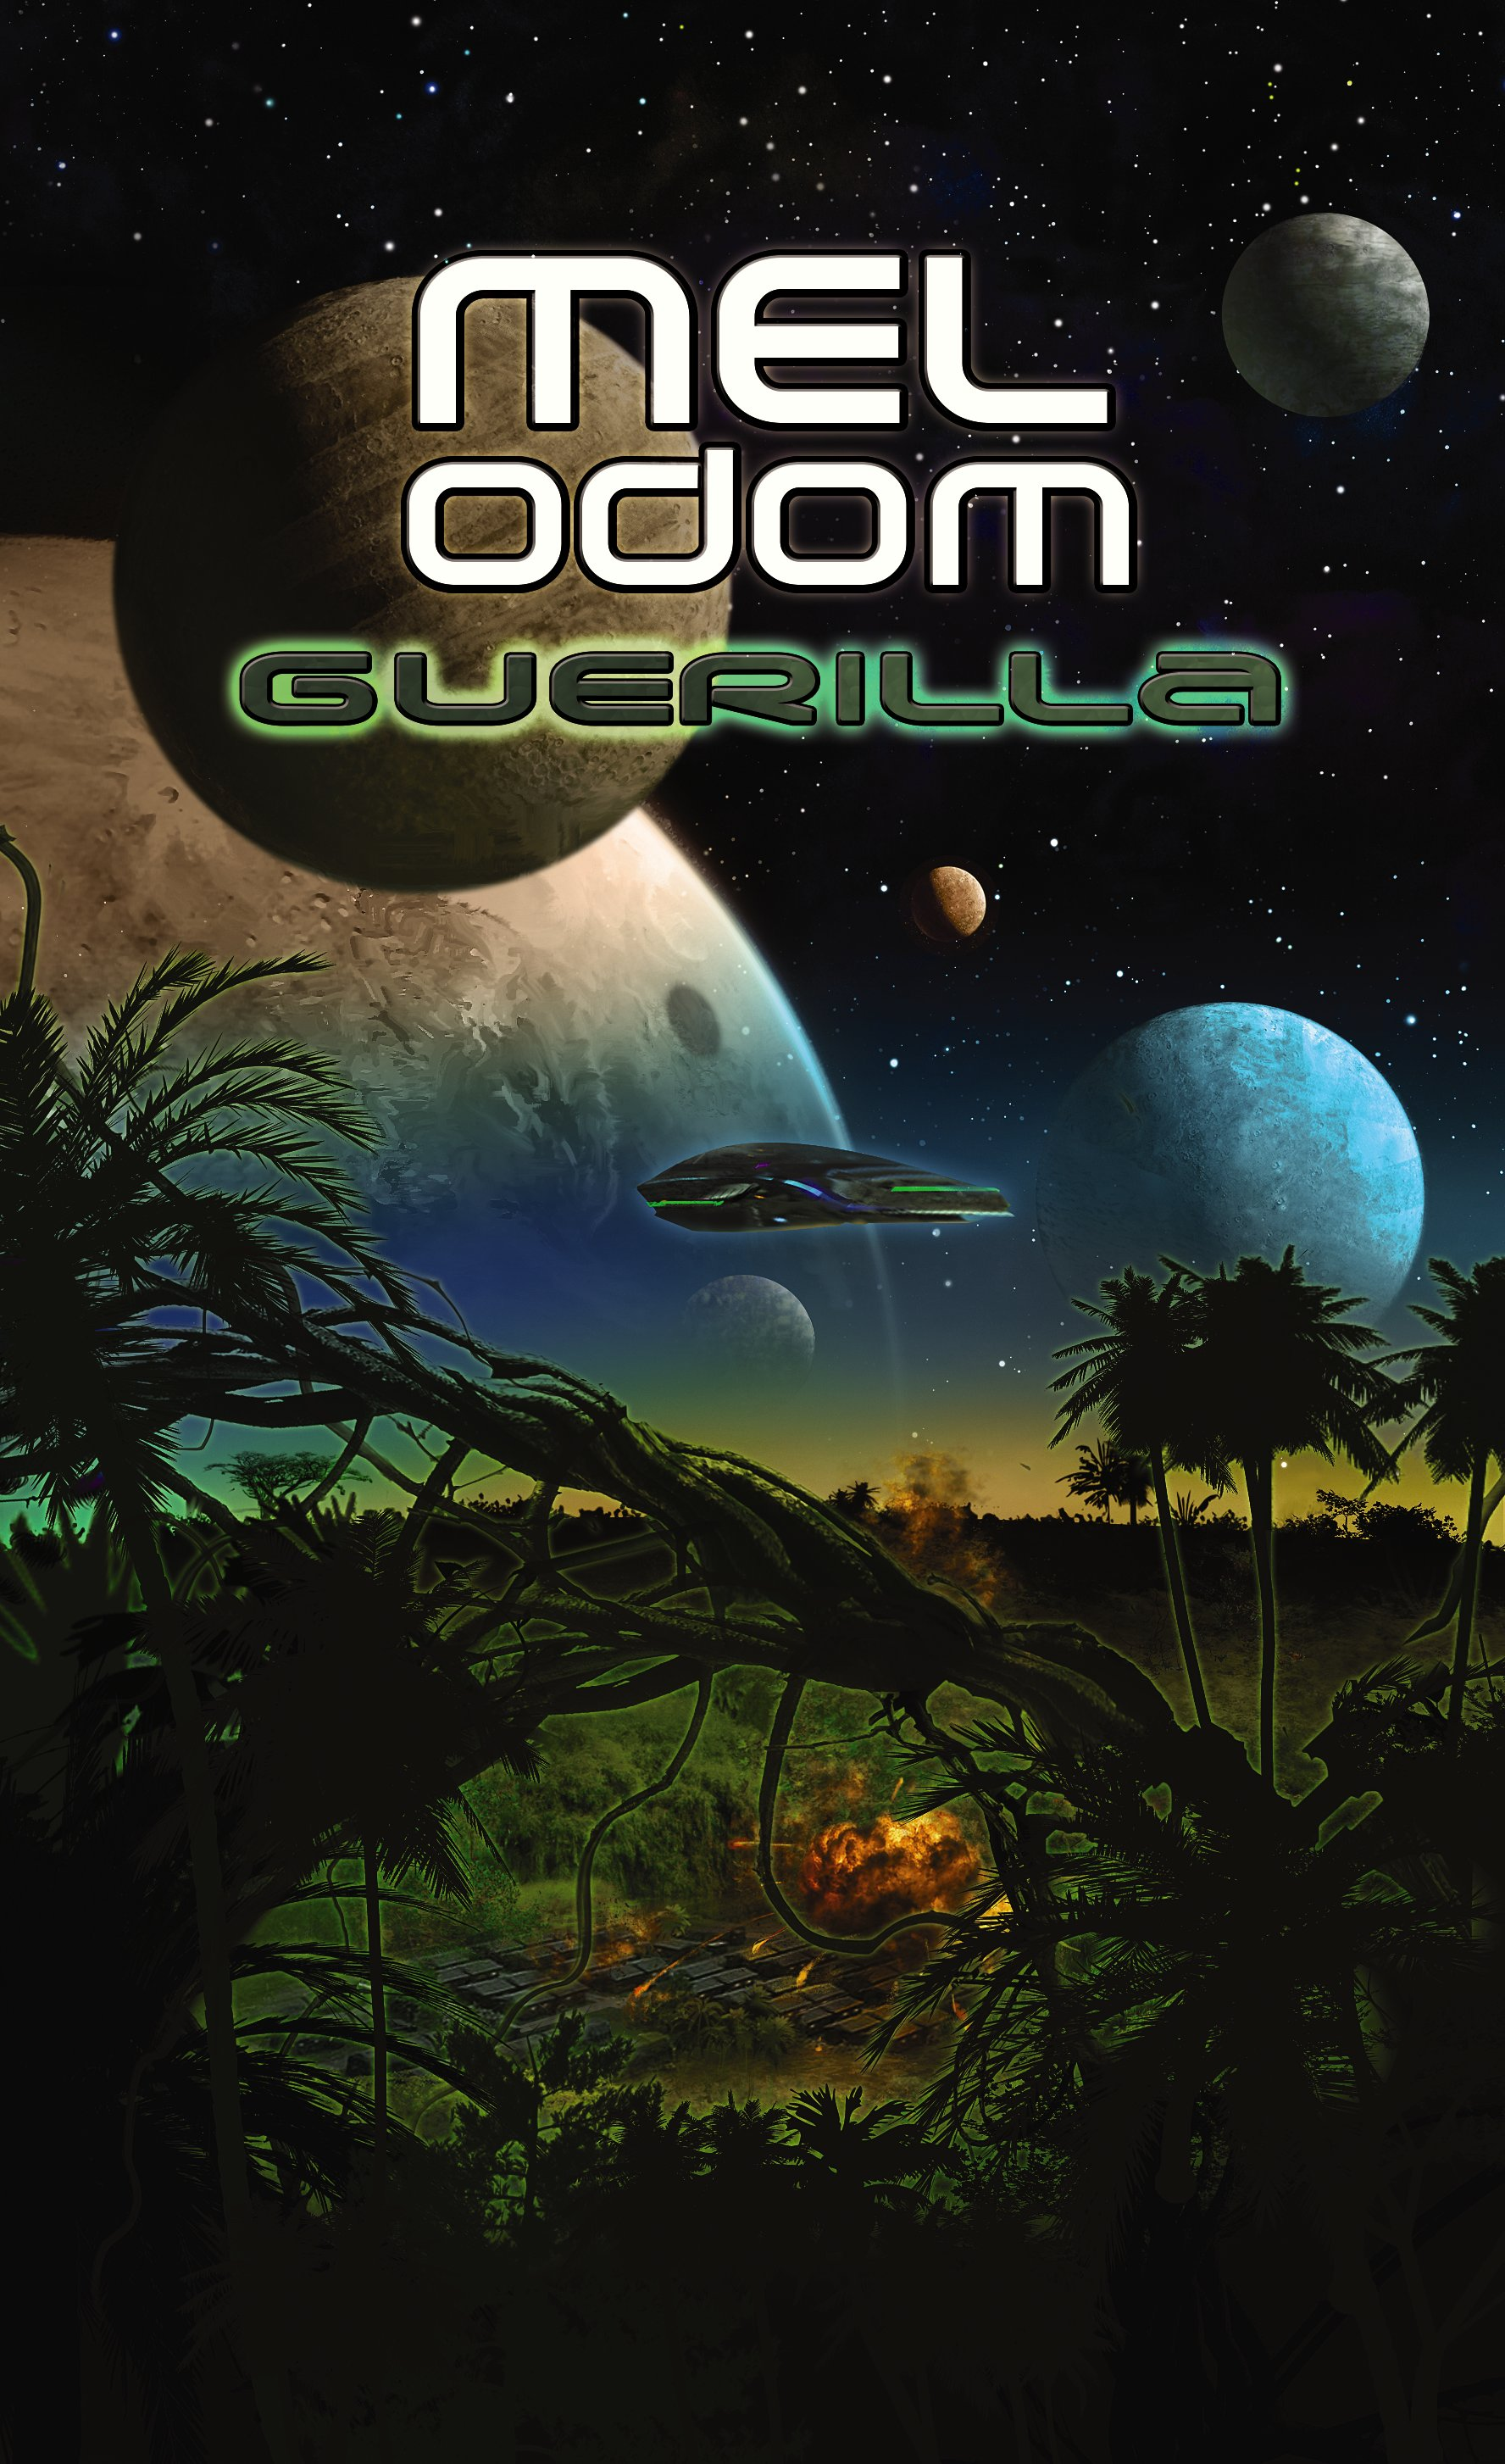 guerilla cover art